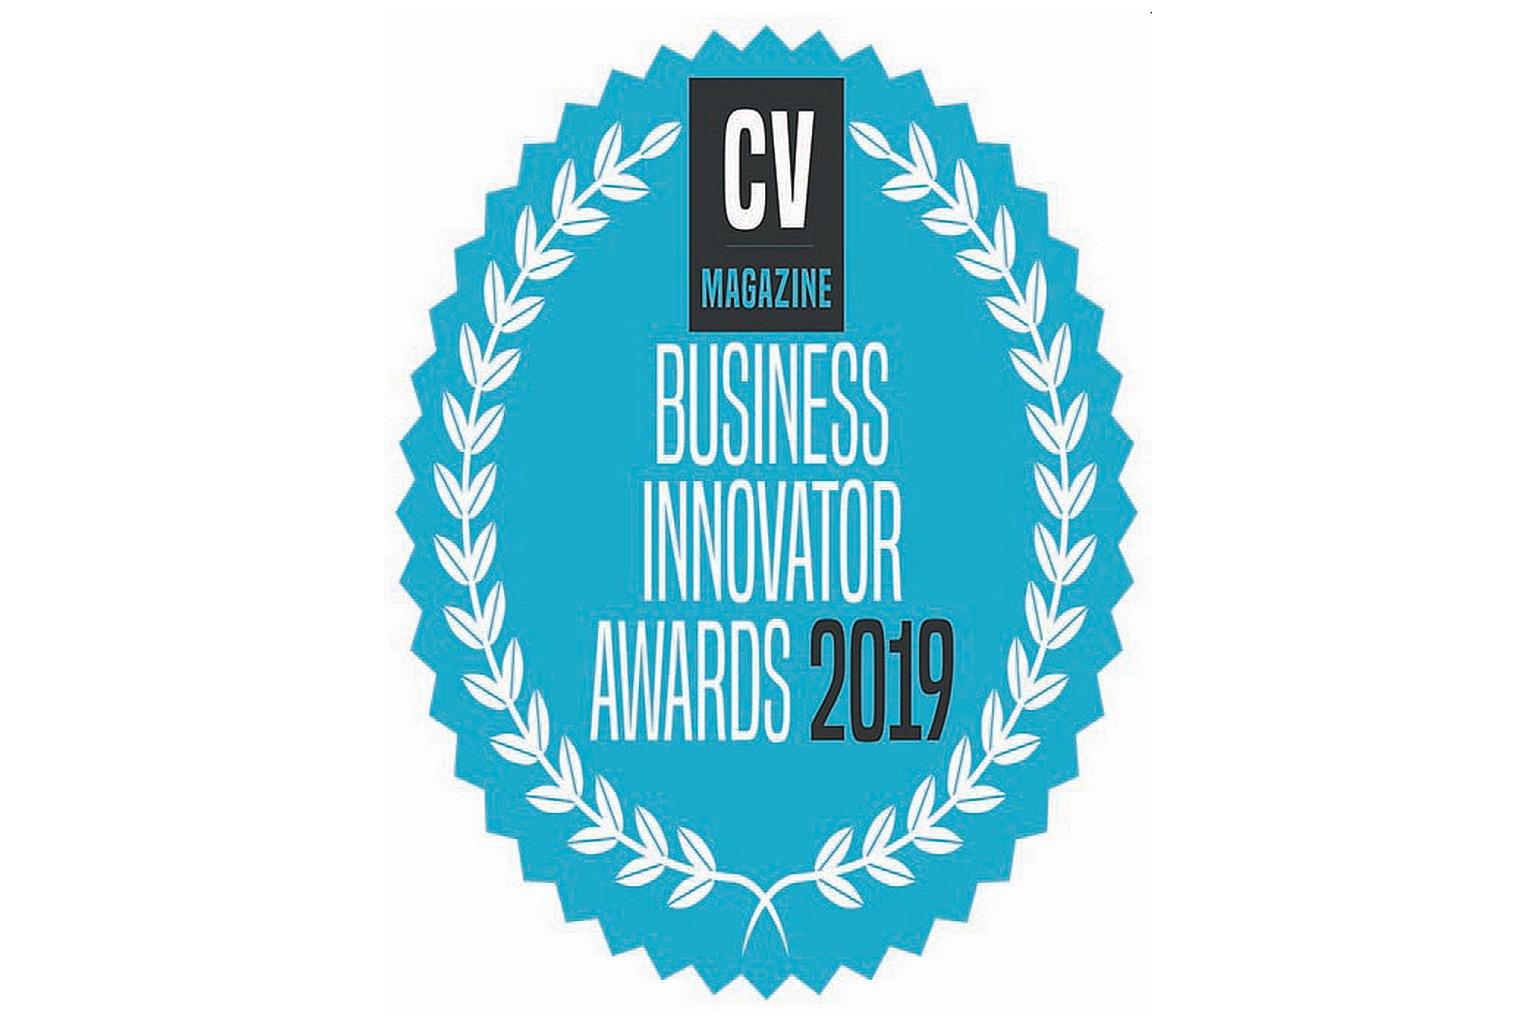 CT Corporation wins business innovator award